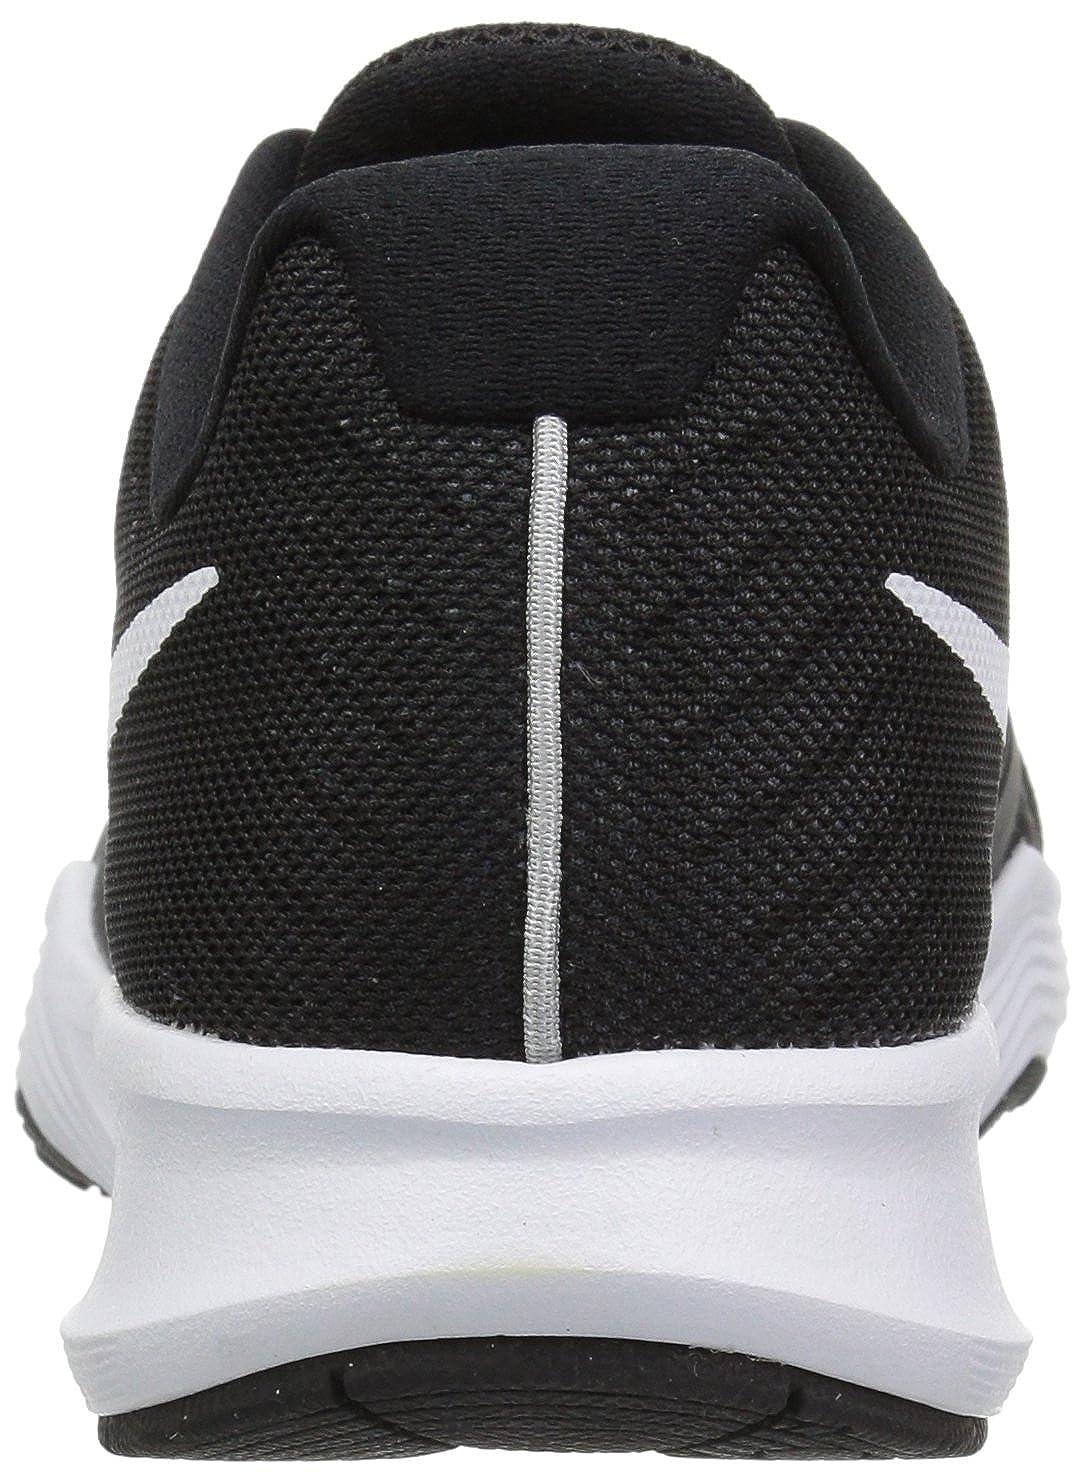 Nike City City City Trainer, Scarpe da Fitness Donna 606314